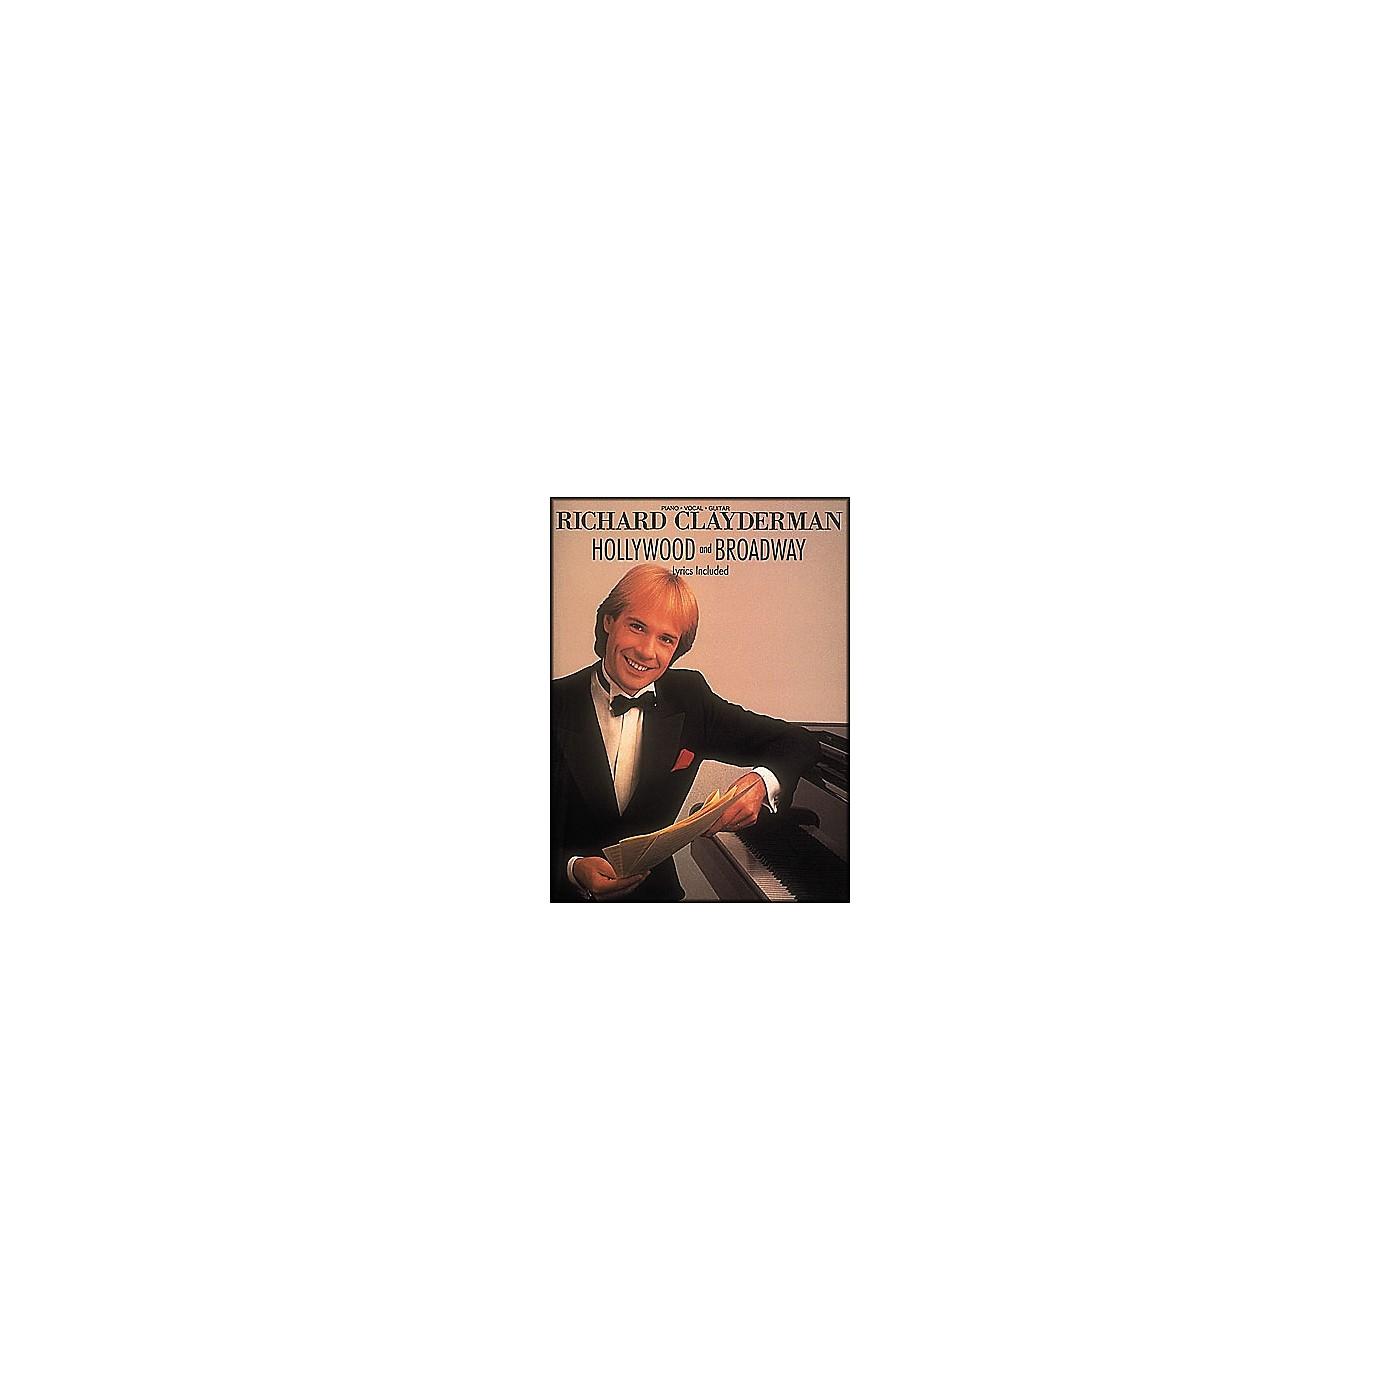 Hal Leonard Richard Clayderman - Hollywood & Broadway arranged for piano solo thumbnail